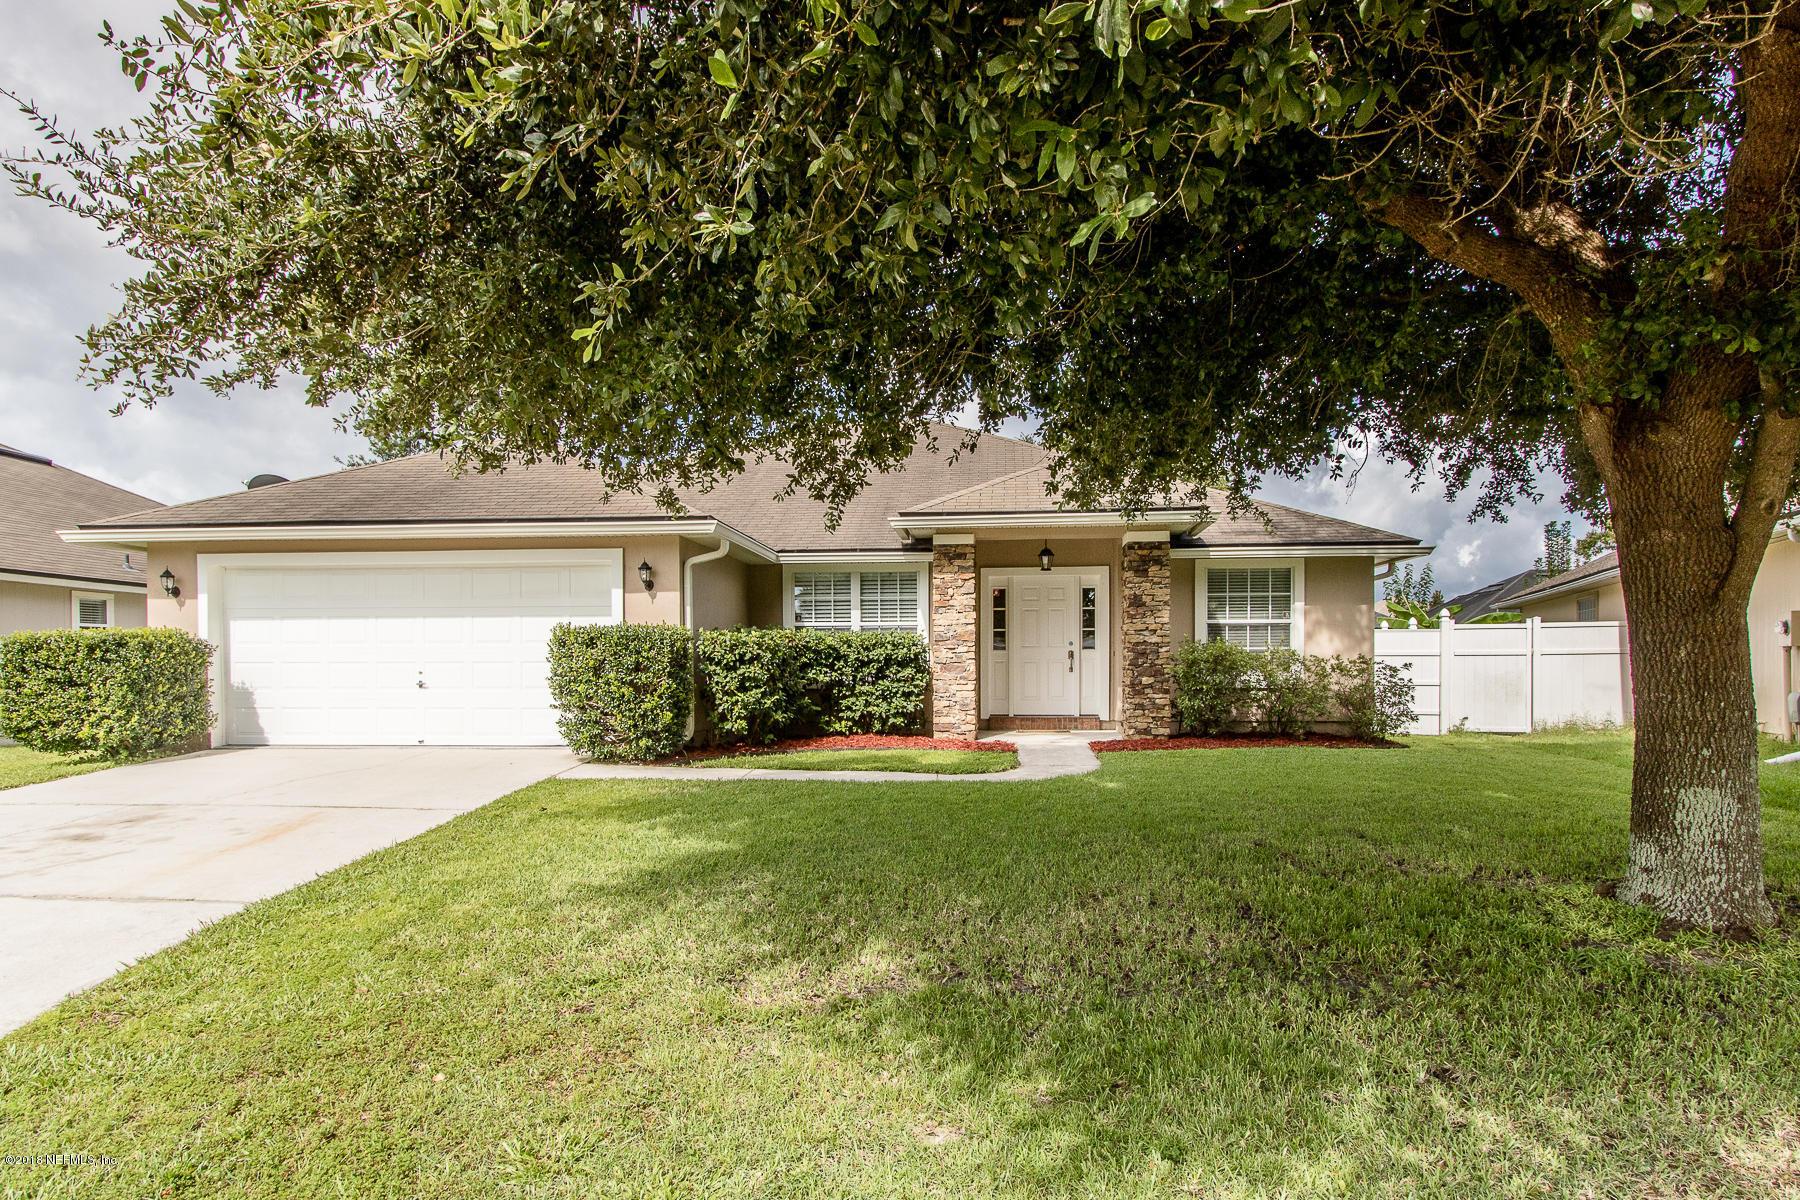 2856 CROSS CREEK, GREEN COVE SPRINGS, FLORIDA 32043, 4 Bedrooms Bedrooms, ,2 BathroomsBathrooms,Residential - single family,For sale,CROSS CREEK,953557